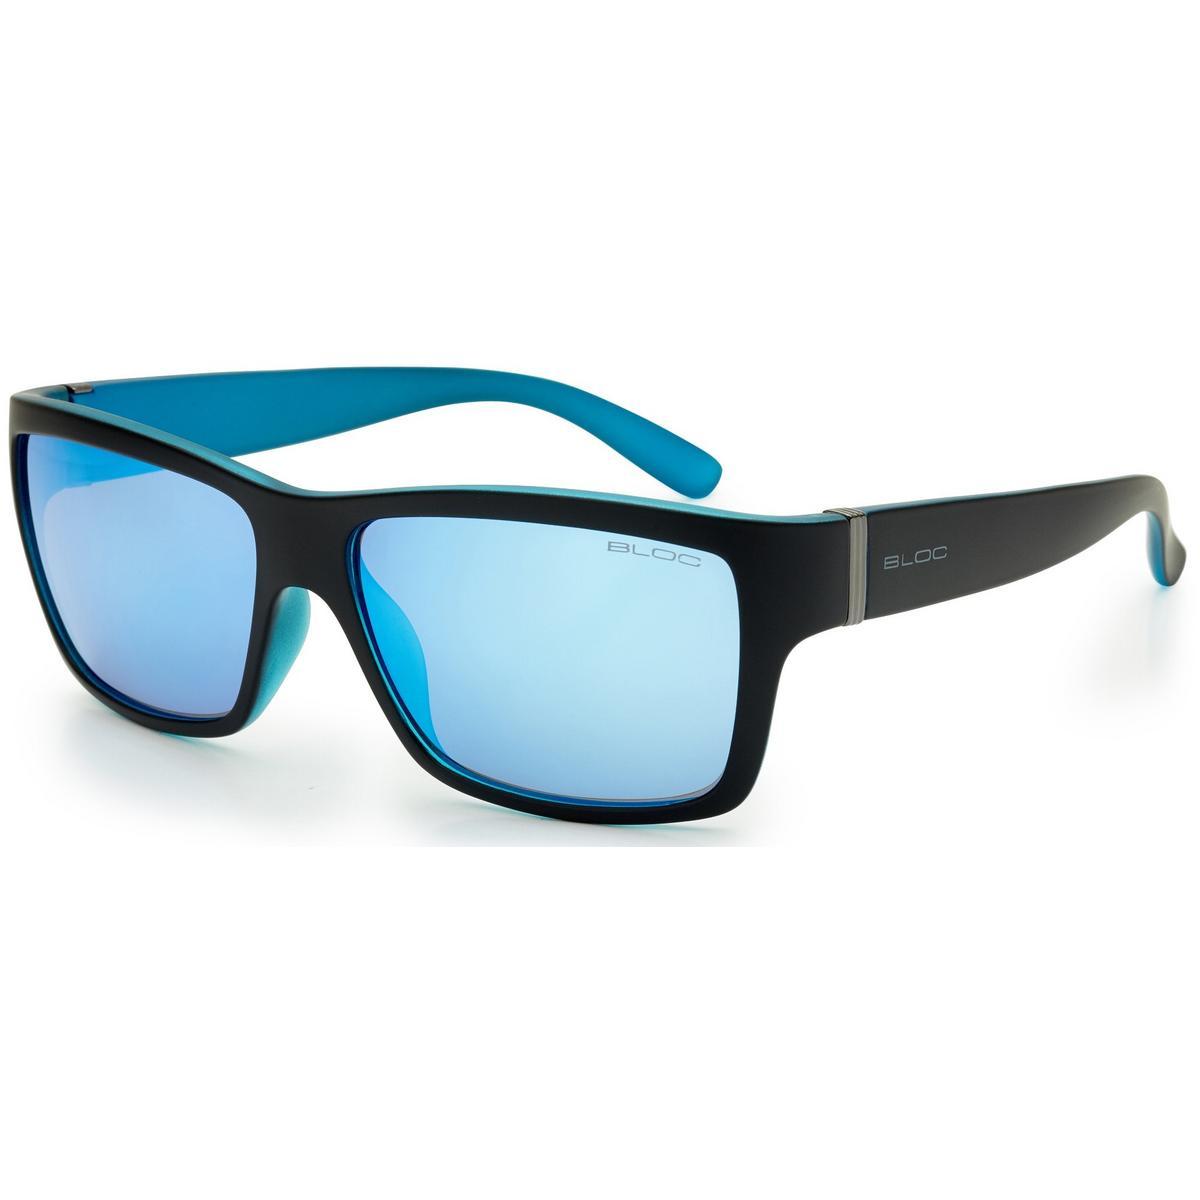 Bloc Riser Matt Black Sunglasses